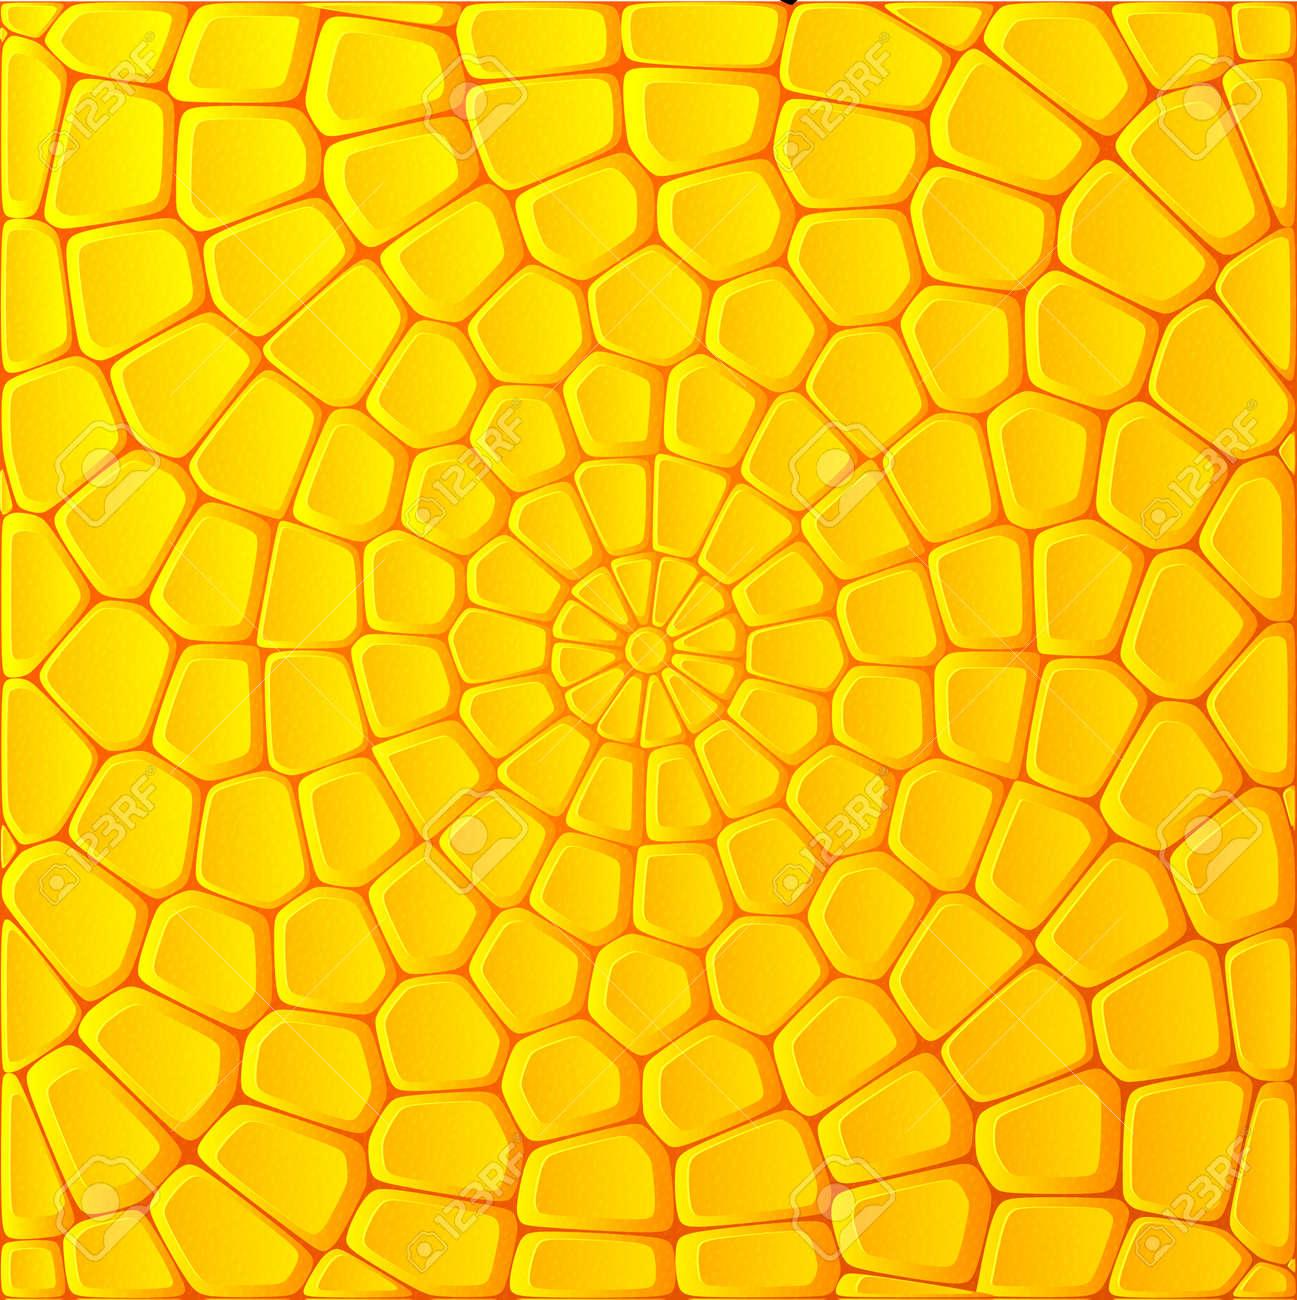 Yellow corn bricks vector abstract background - 18410463